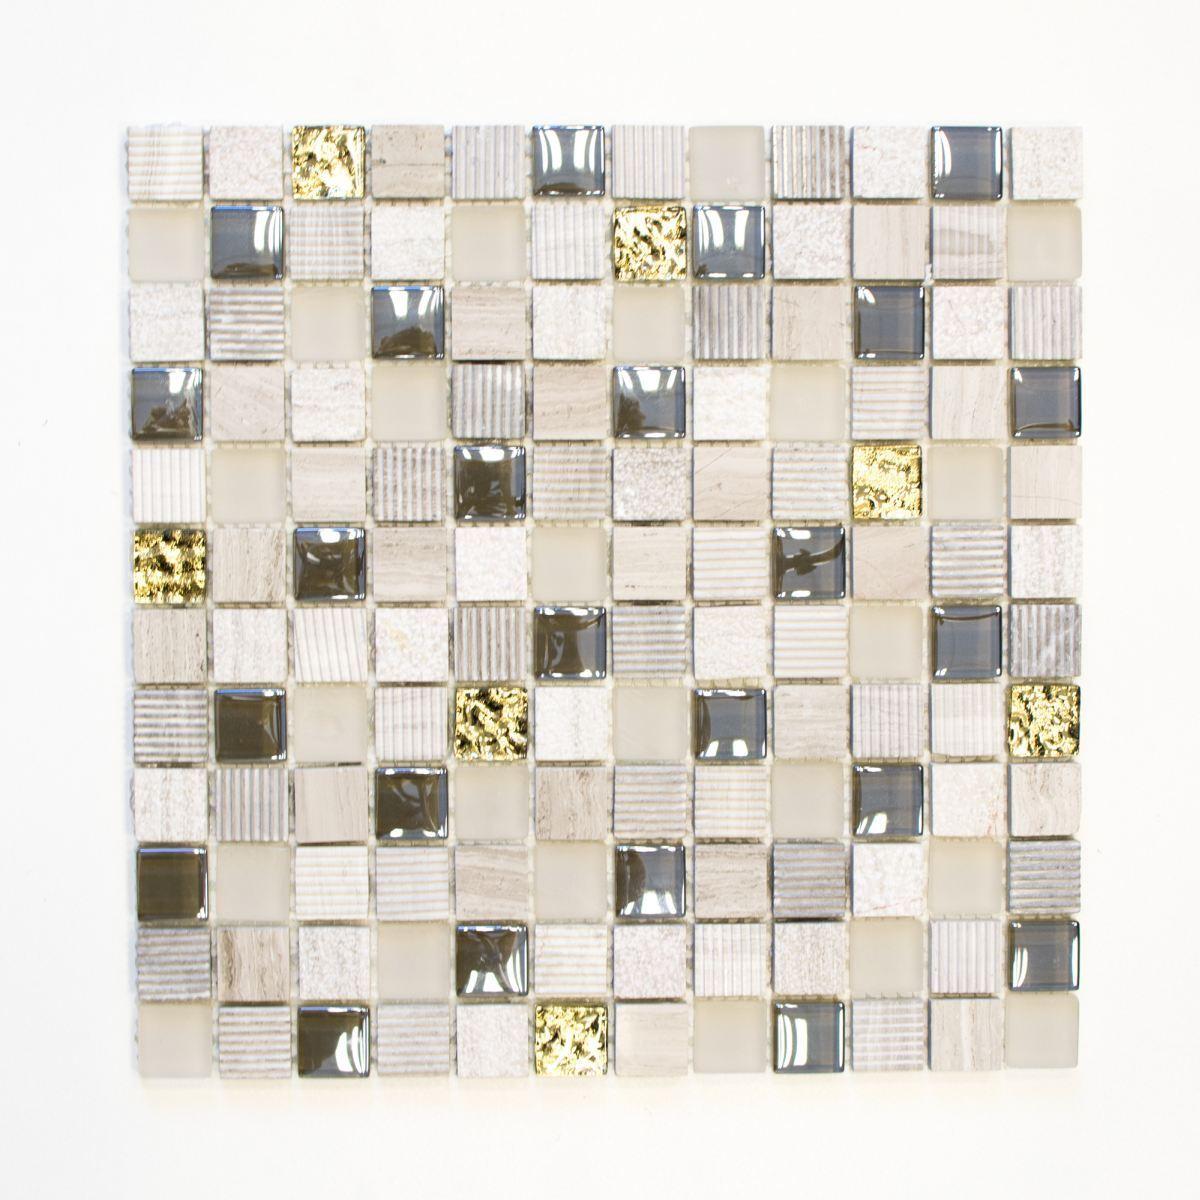 Mosaik Fliese Transluzent hellgrau gold mosaik Crystal 83-HQ22_f 10 Matten